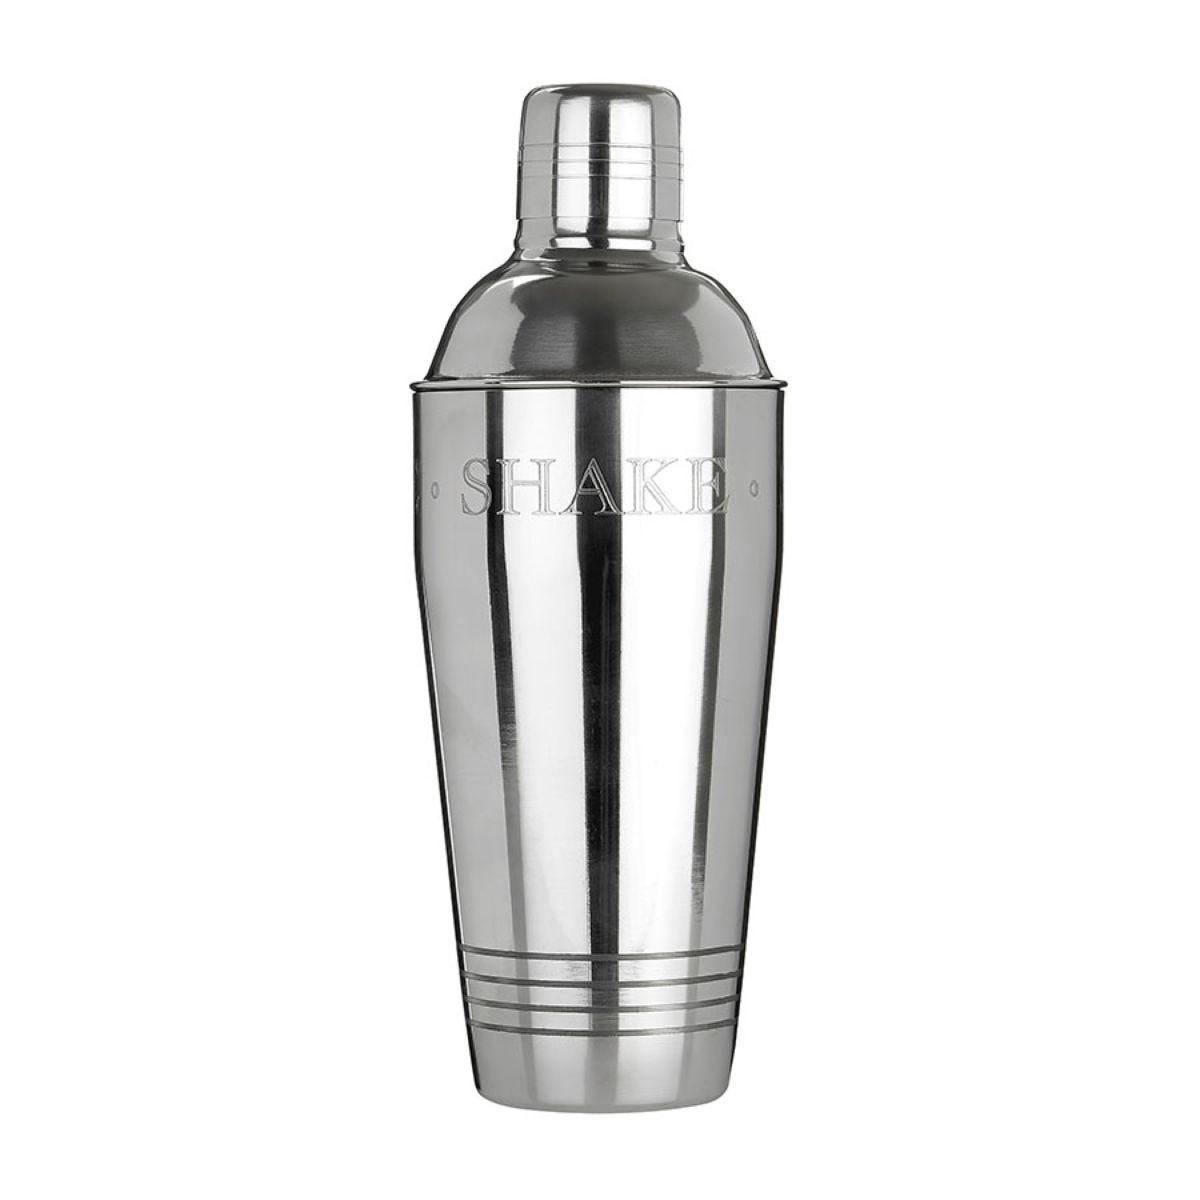 Premier Housewares 750ml Bombay Cocktail Shaker - Stainless Steel